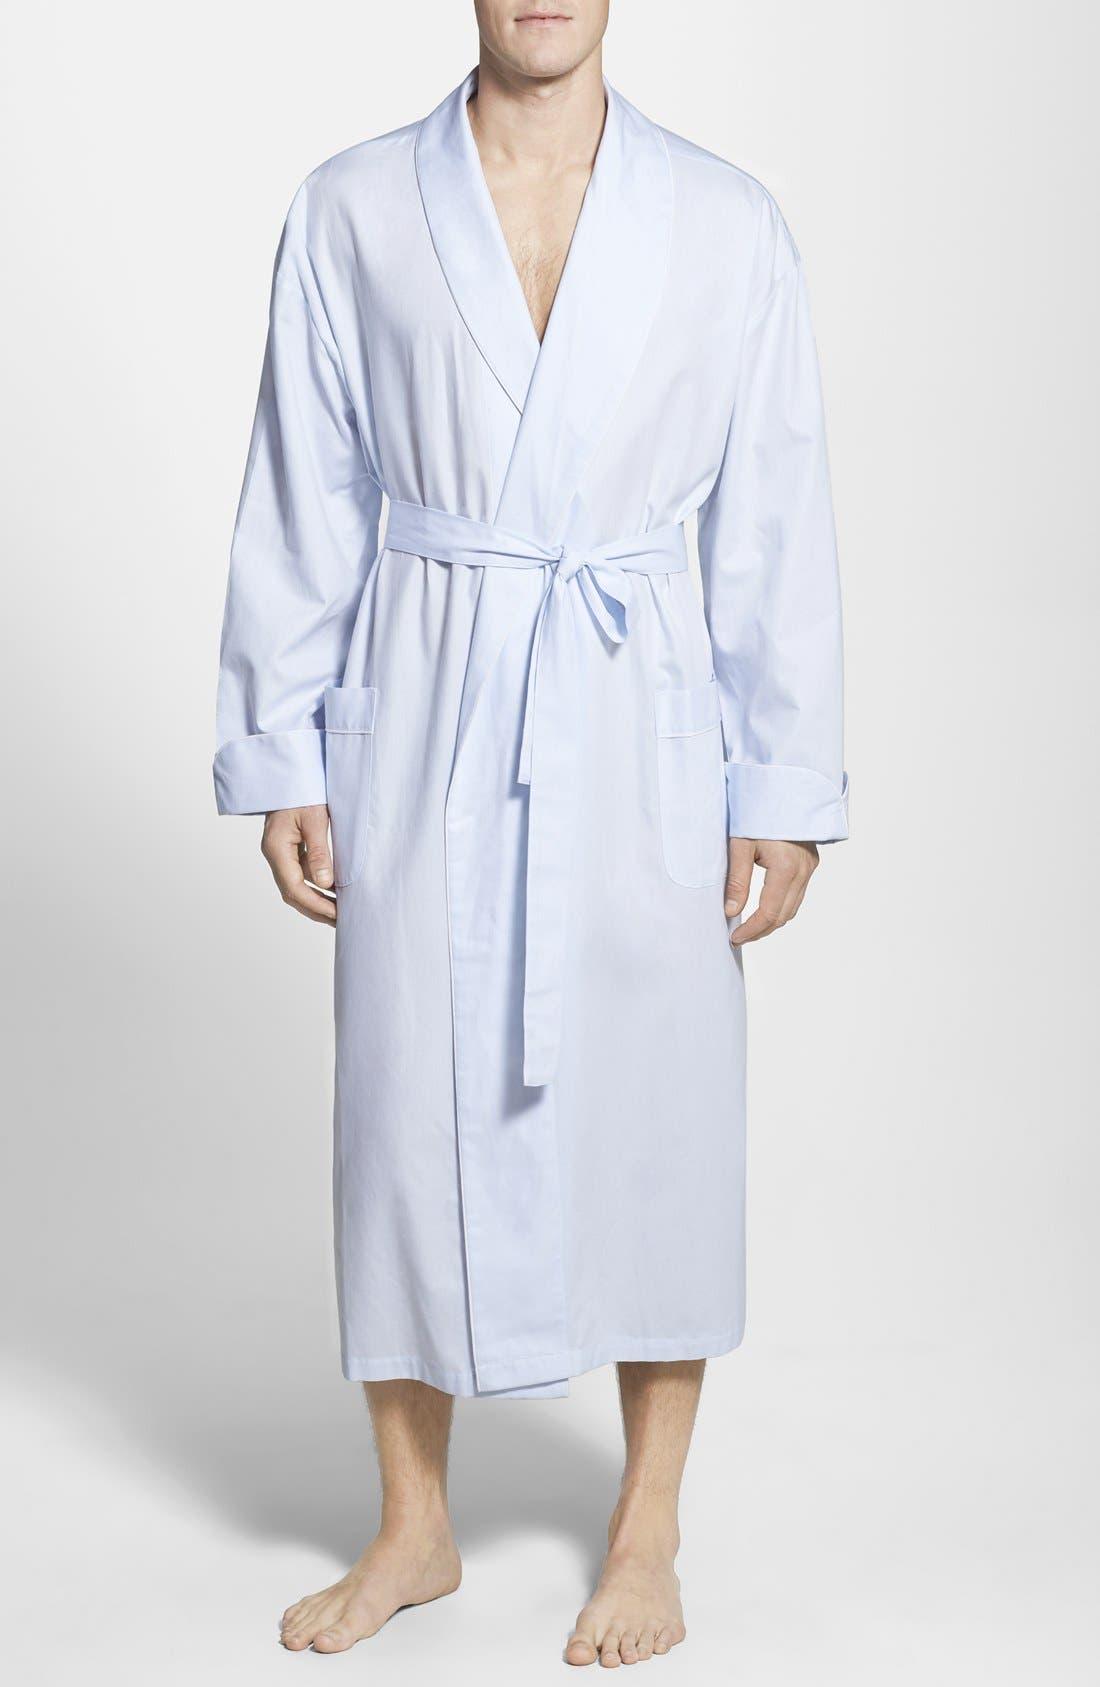 MAJESTIC INTERNATIONAL,                             'Signature' Cotton Robe,                             Main thumbnail 1, color,                             SURF